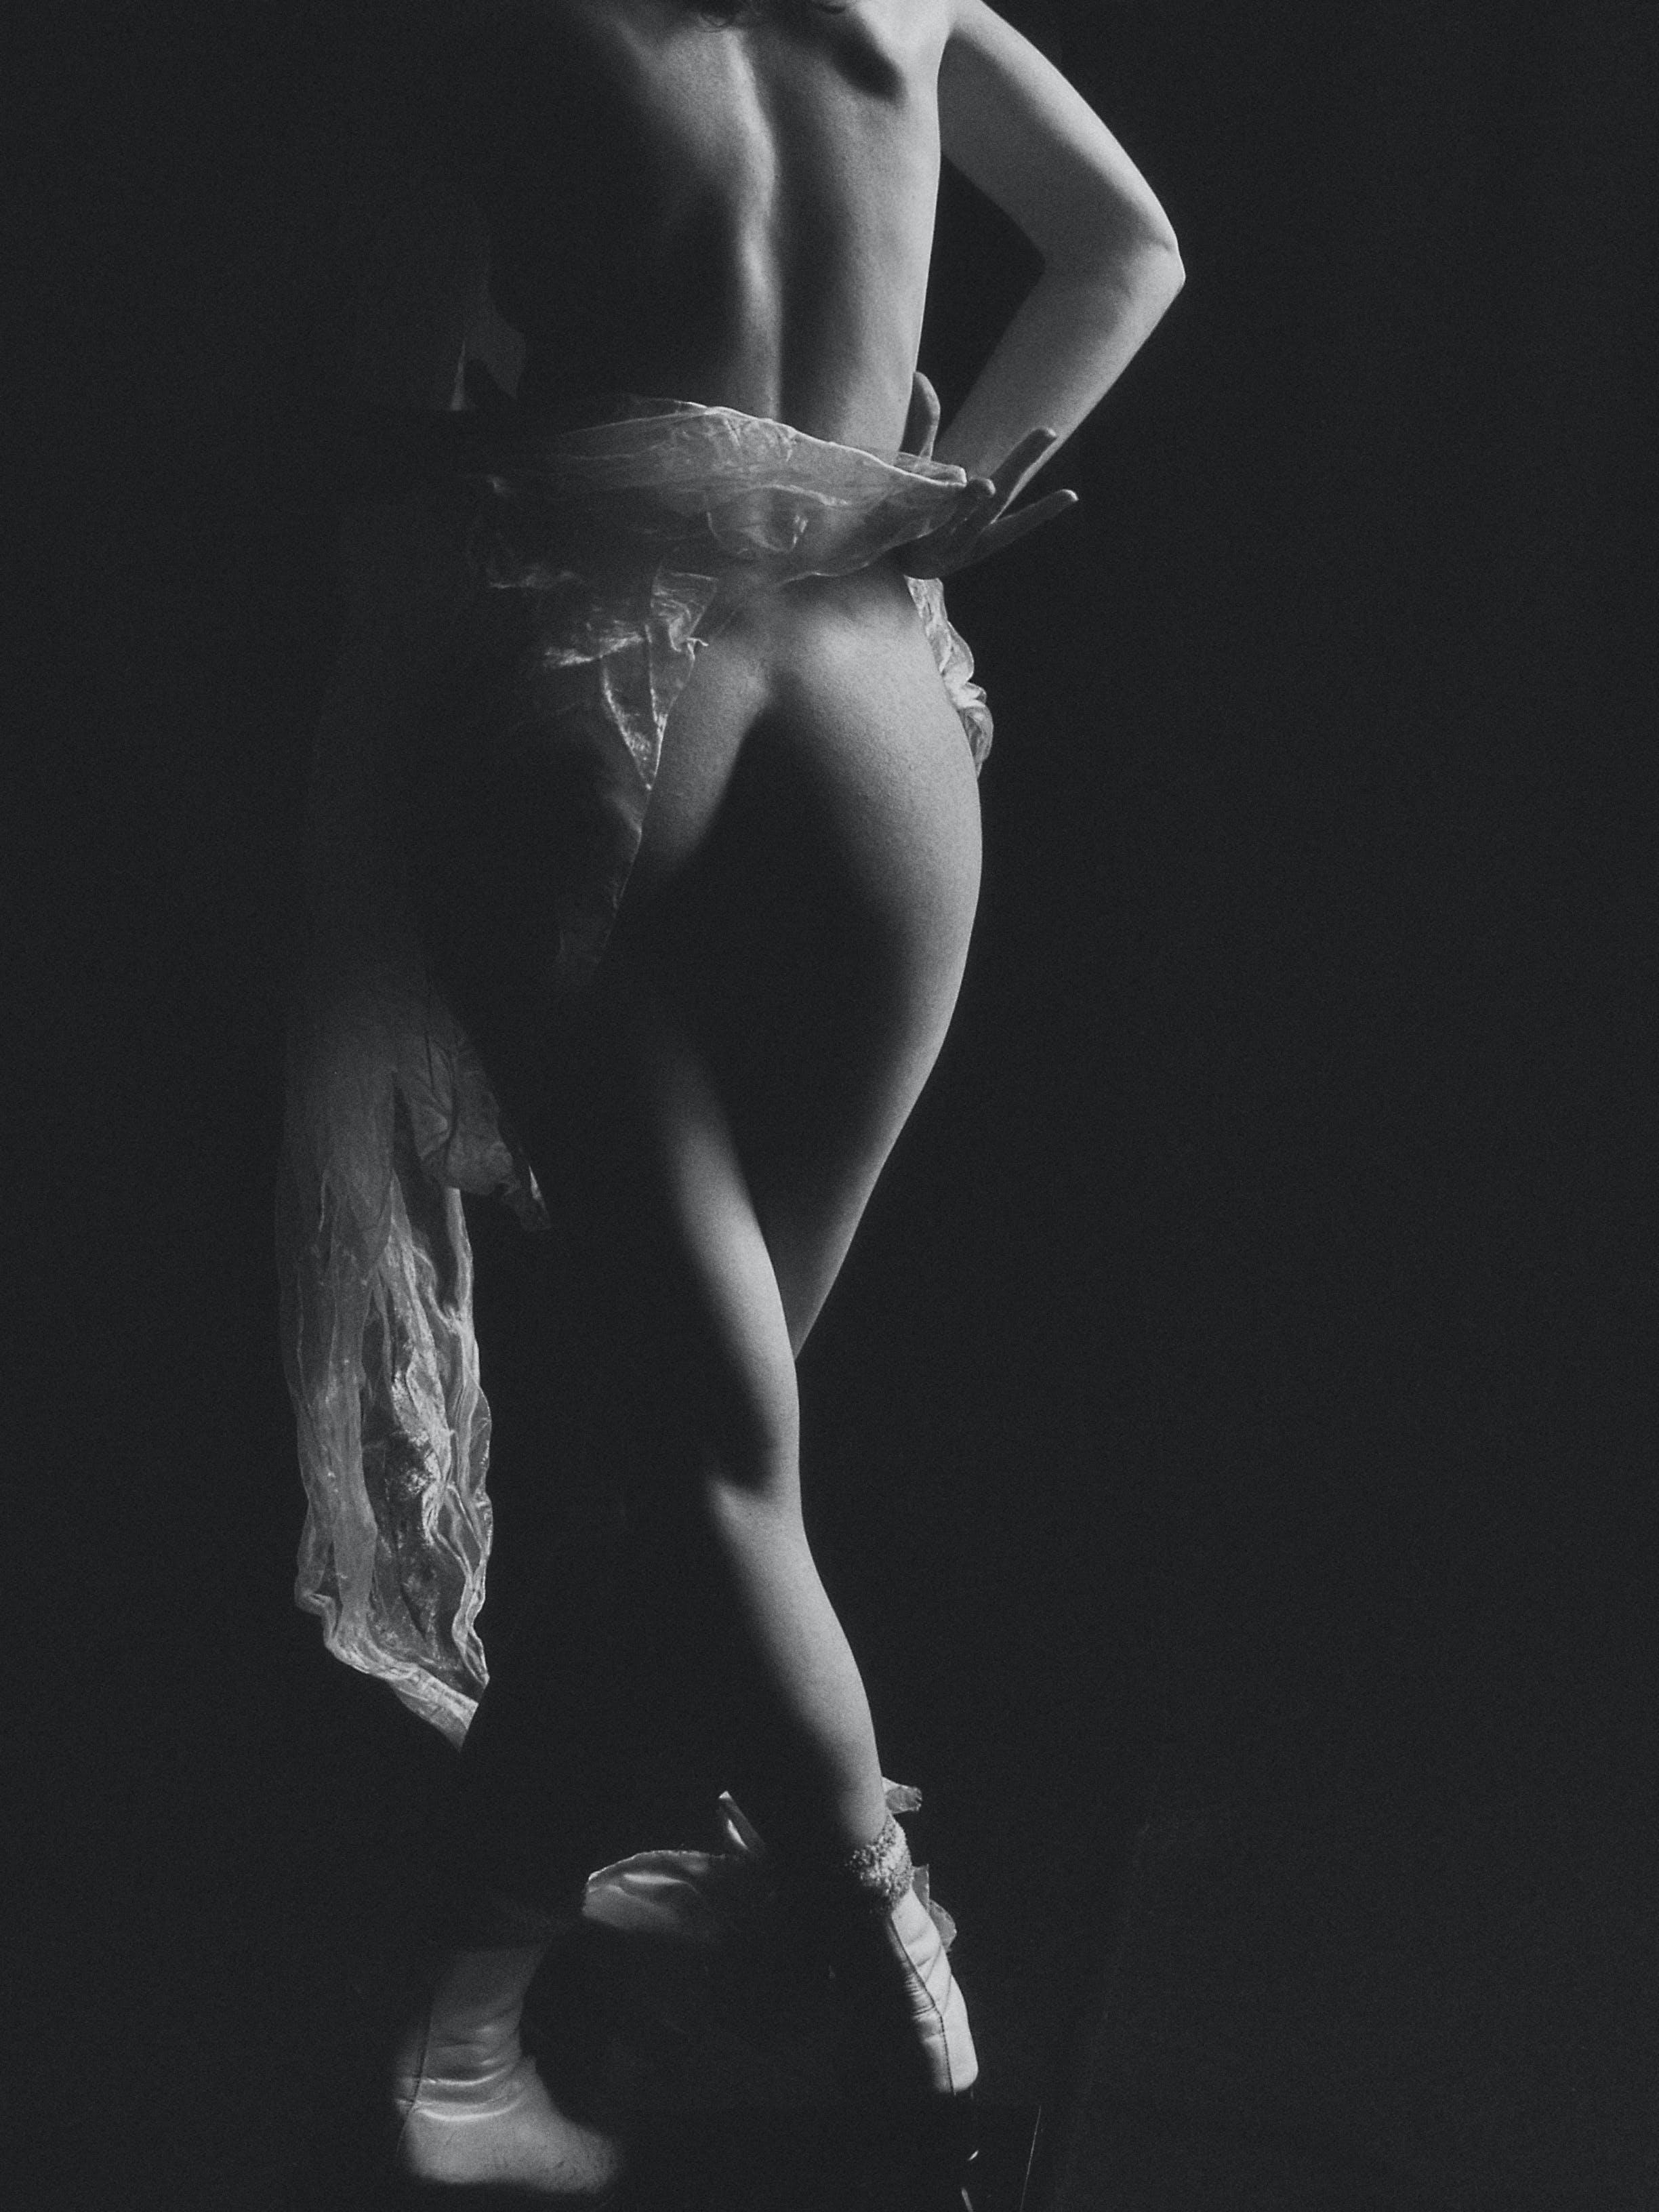 Free stock photo of девушка, студия, тело, черное и белое